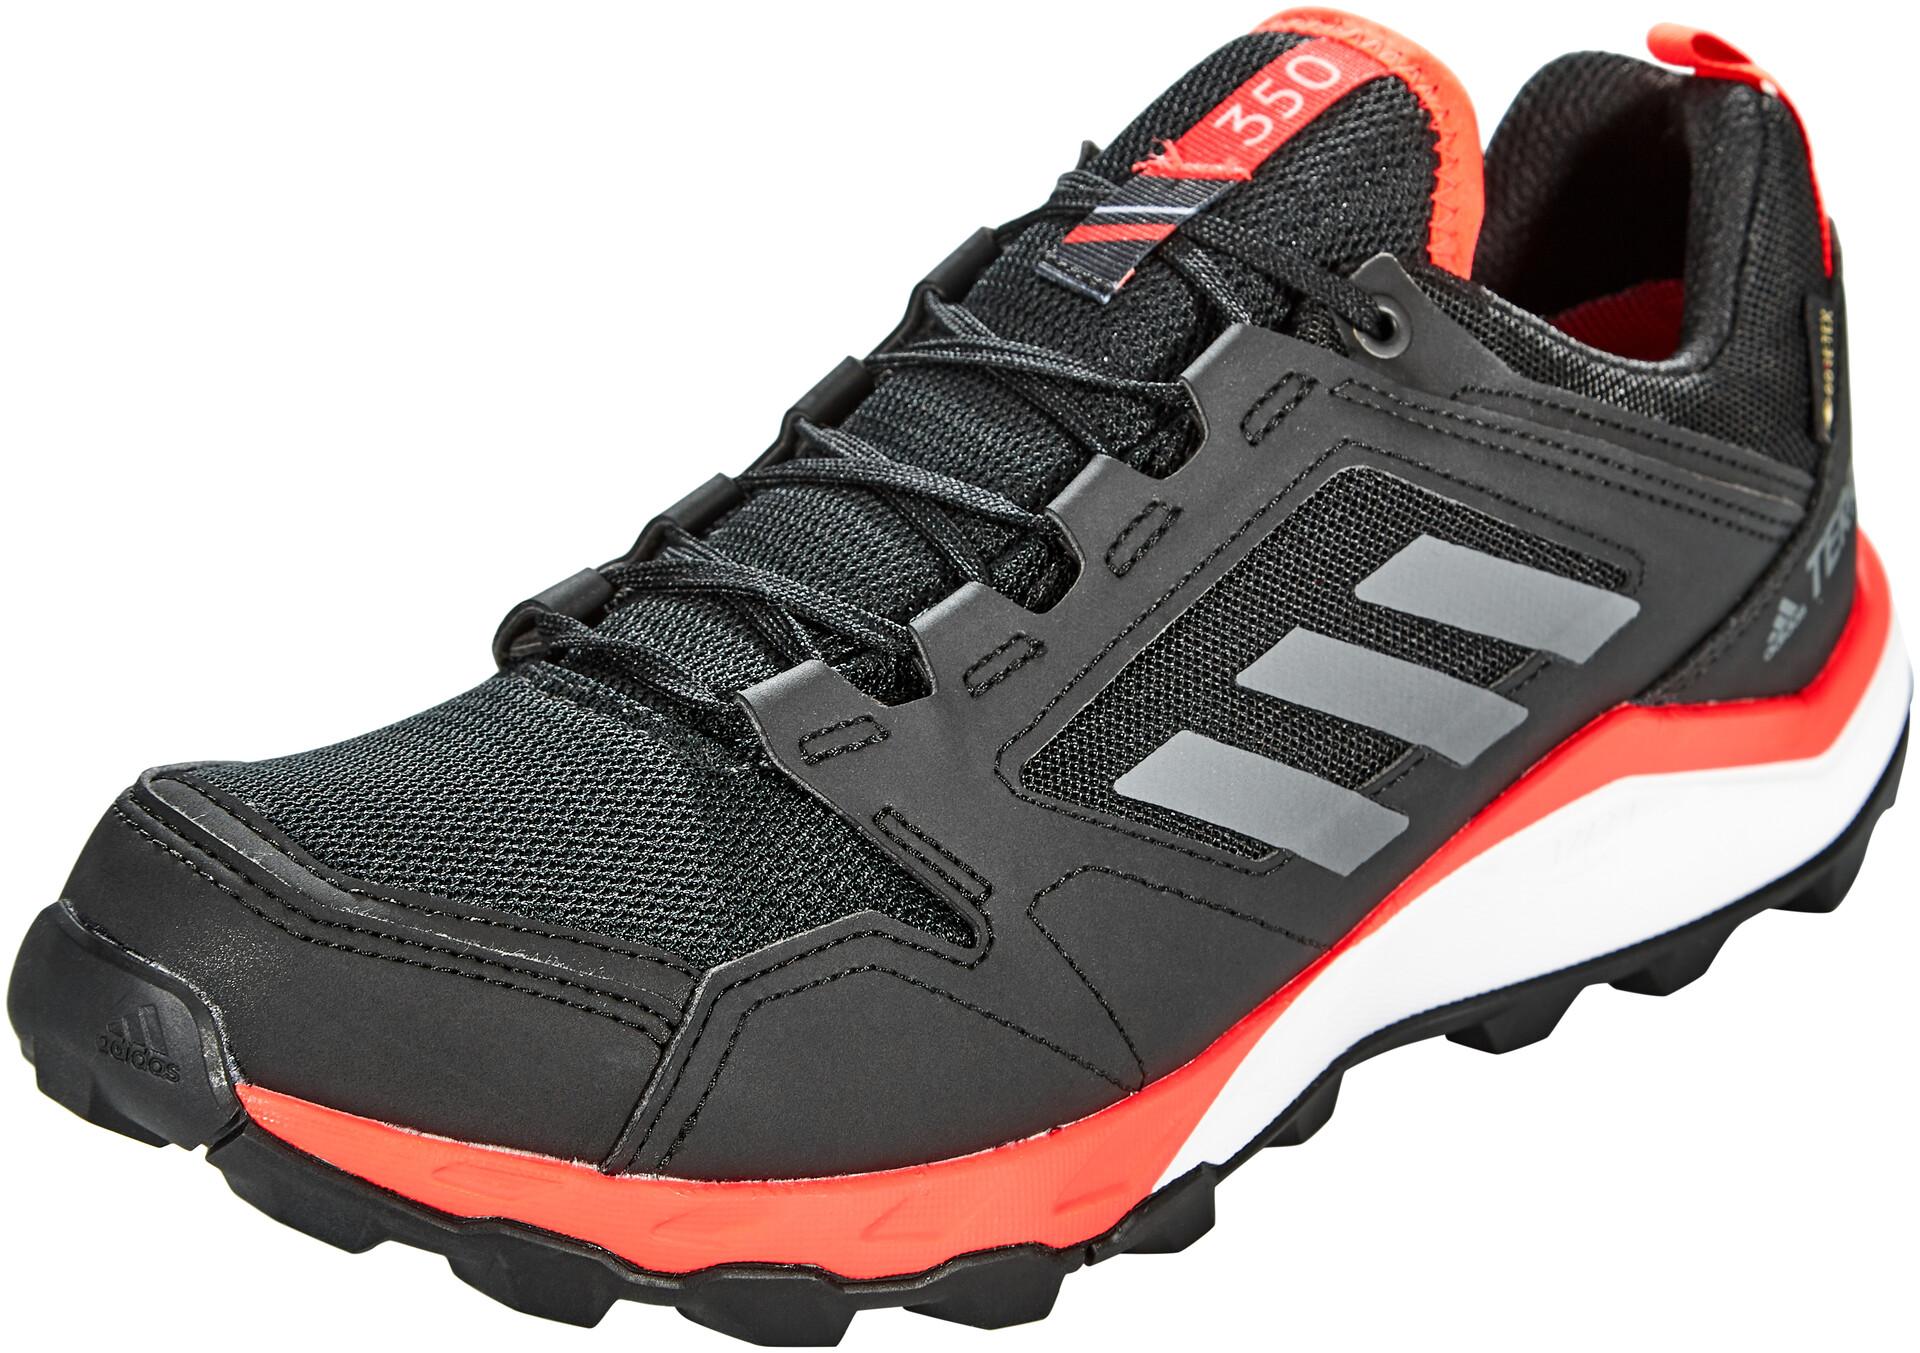 adidas TERREX Agravic Boa Trailrunning Schoenen Heren, solar